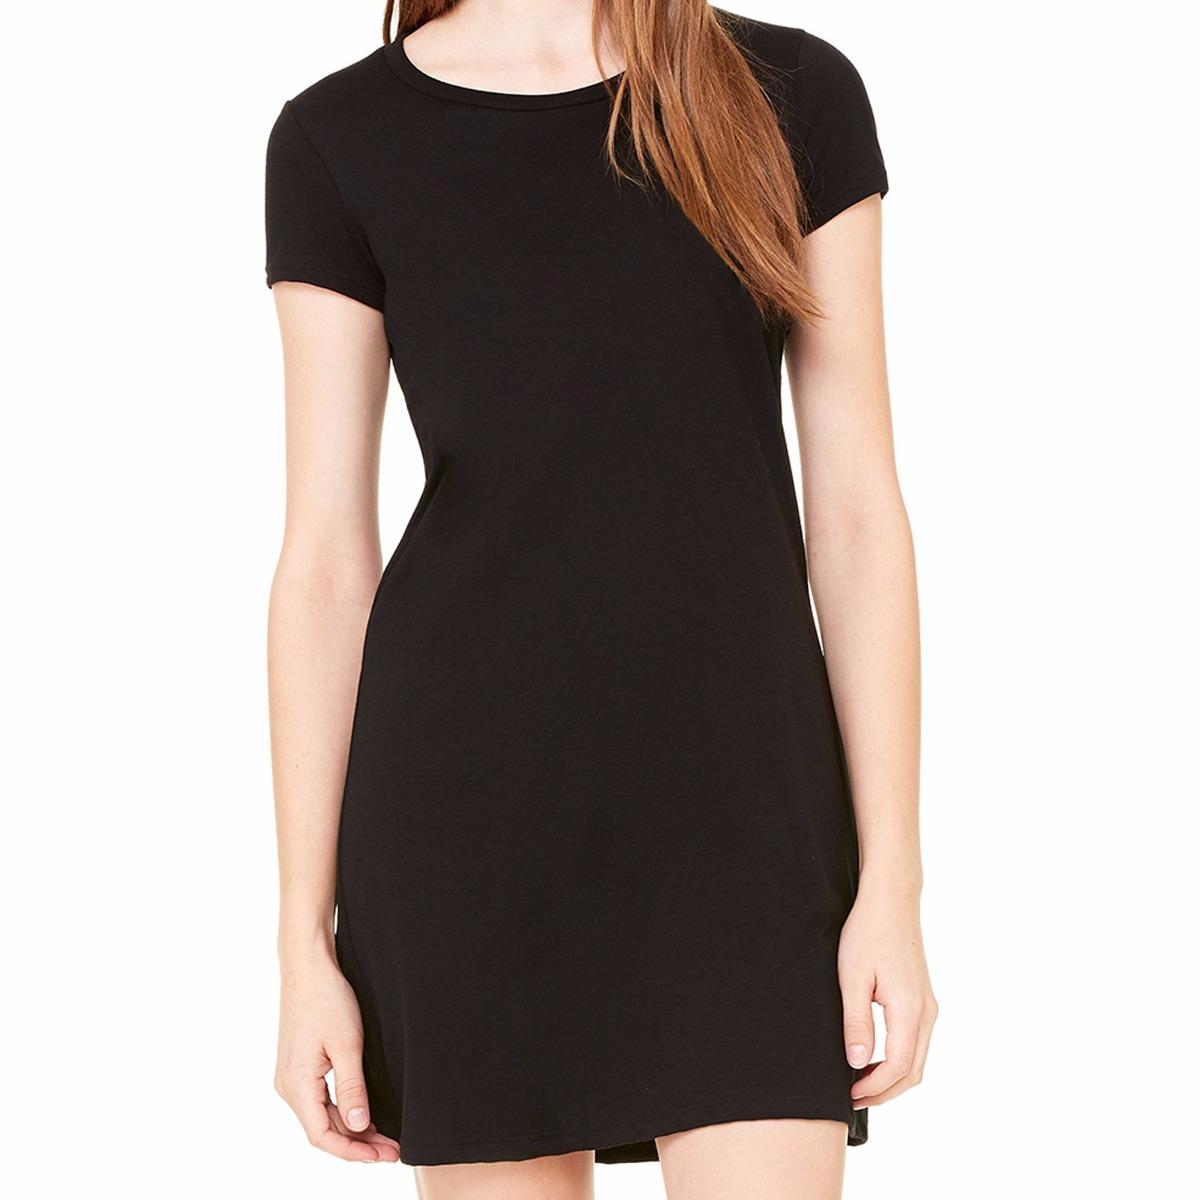 Vestidos simples e baratos